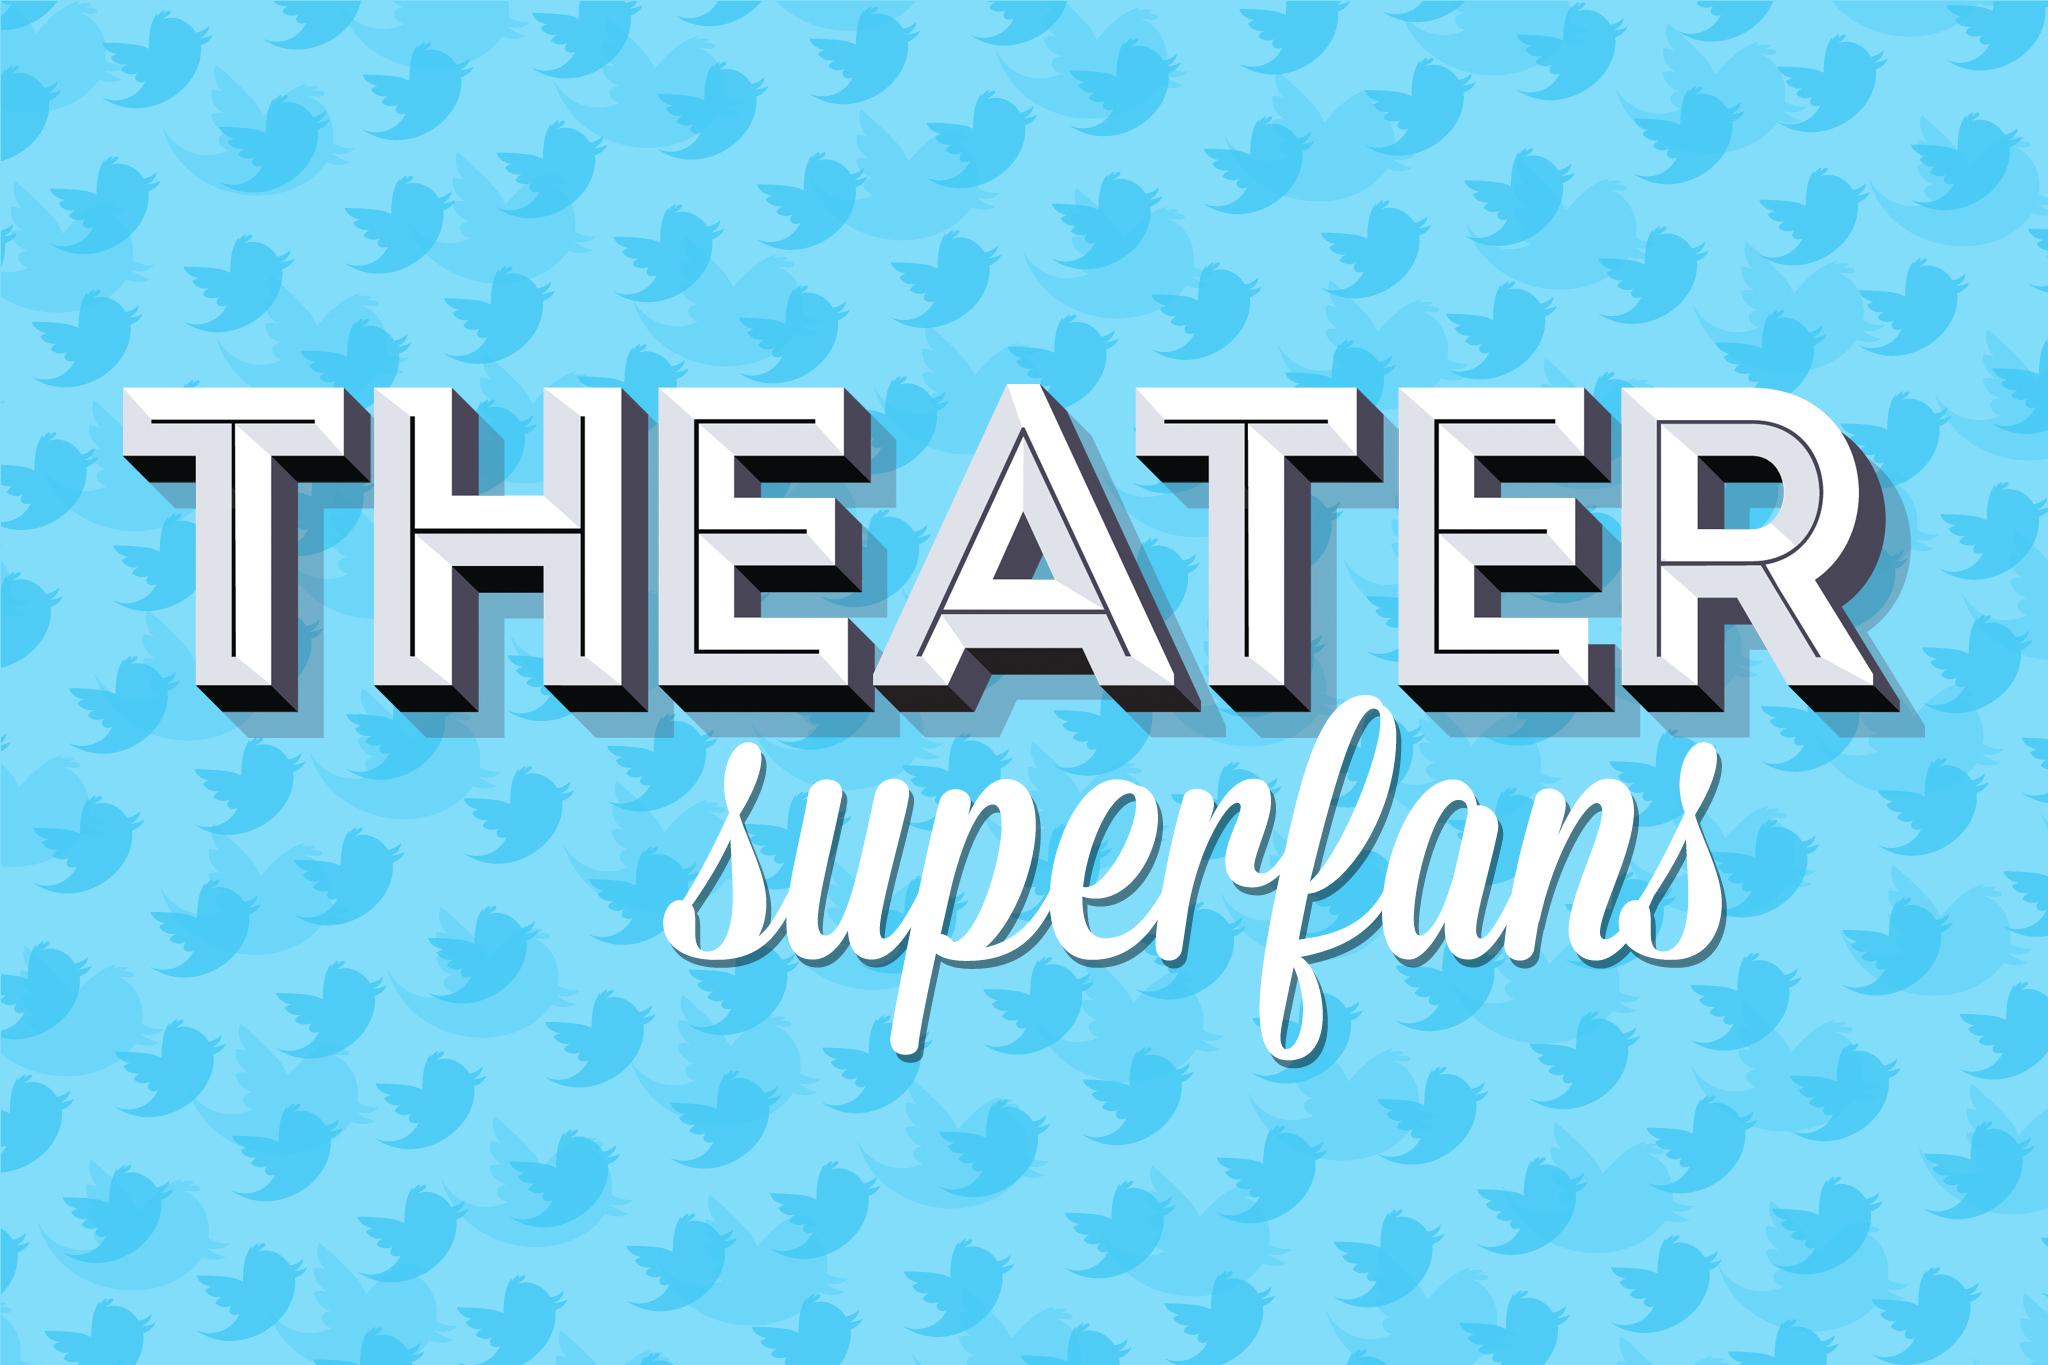 Superfans' tweets